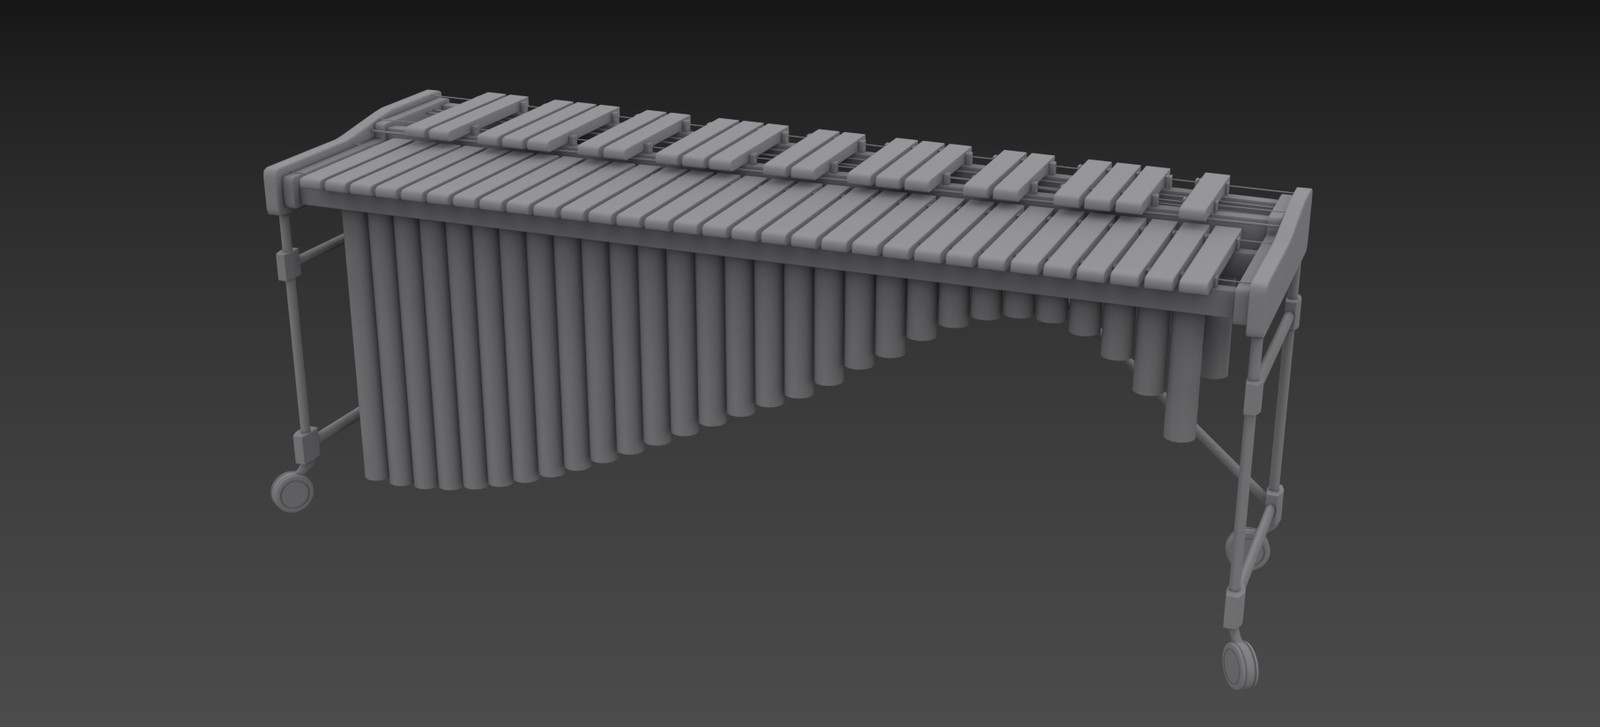 High-poly model of a Marimba